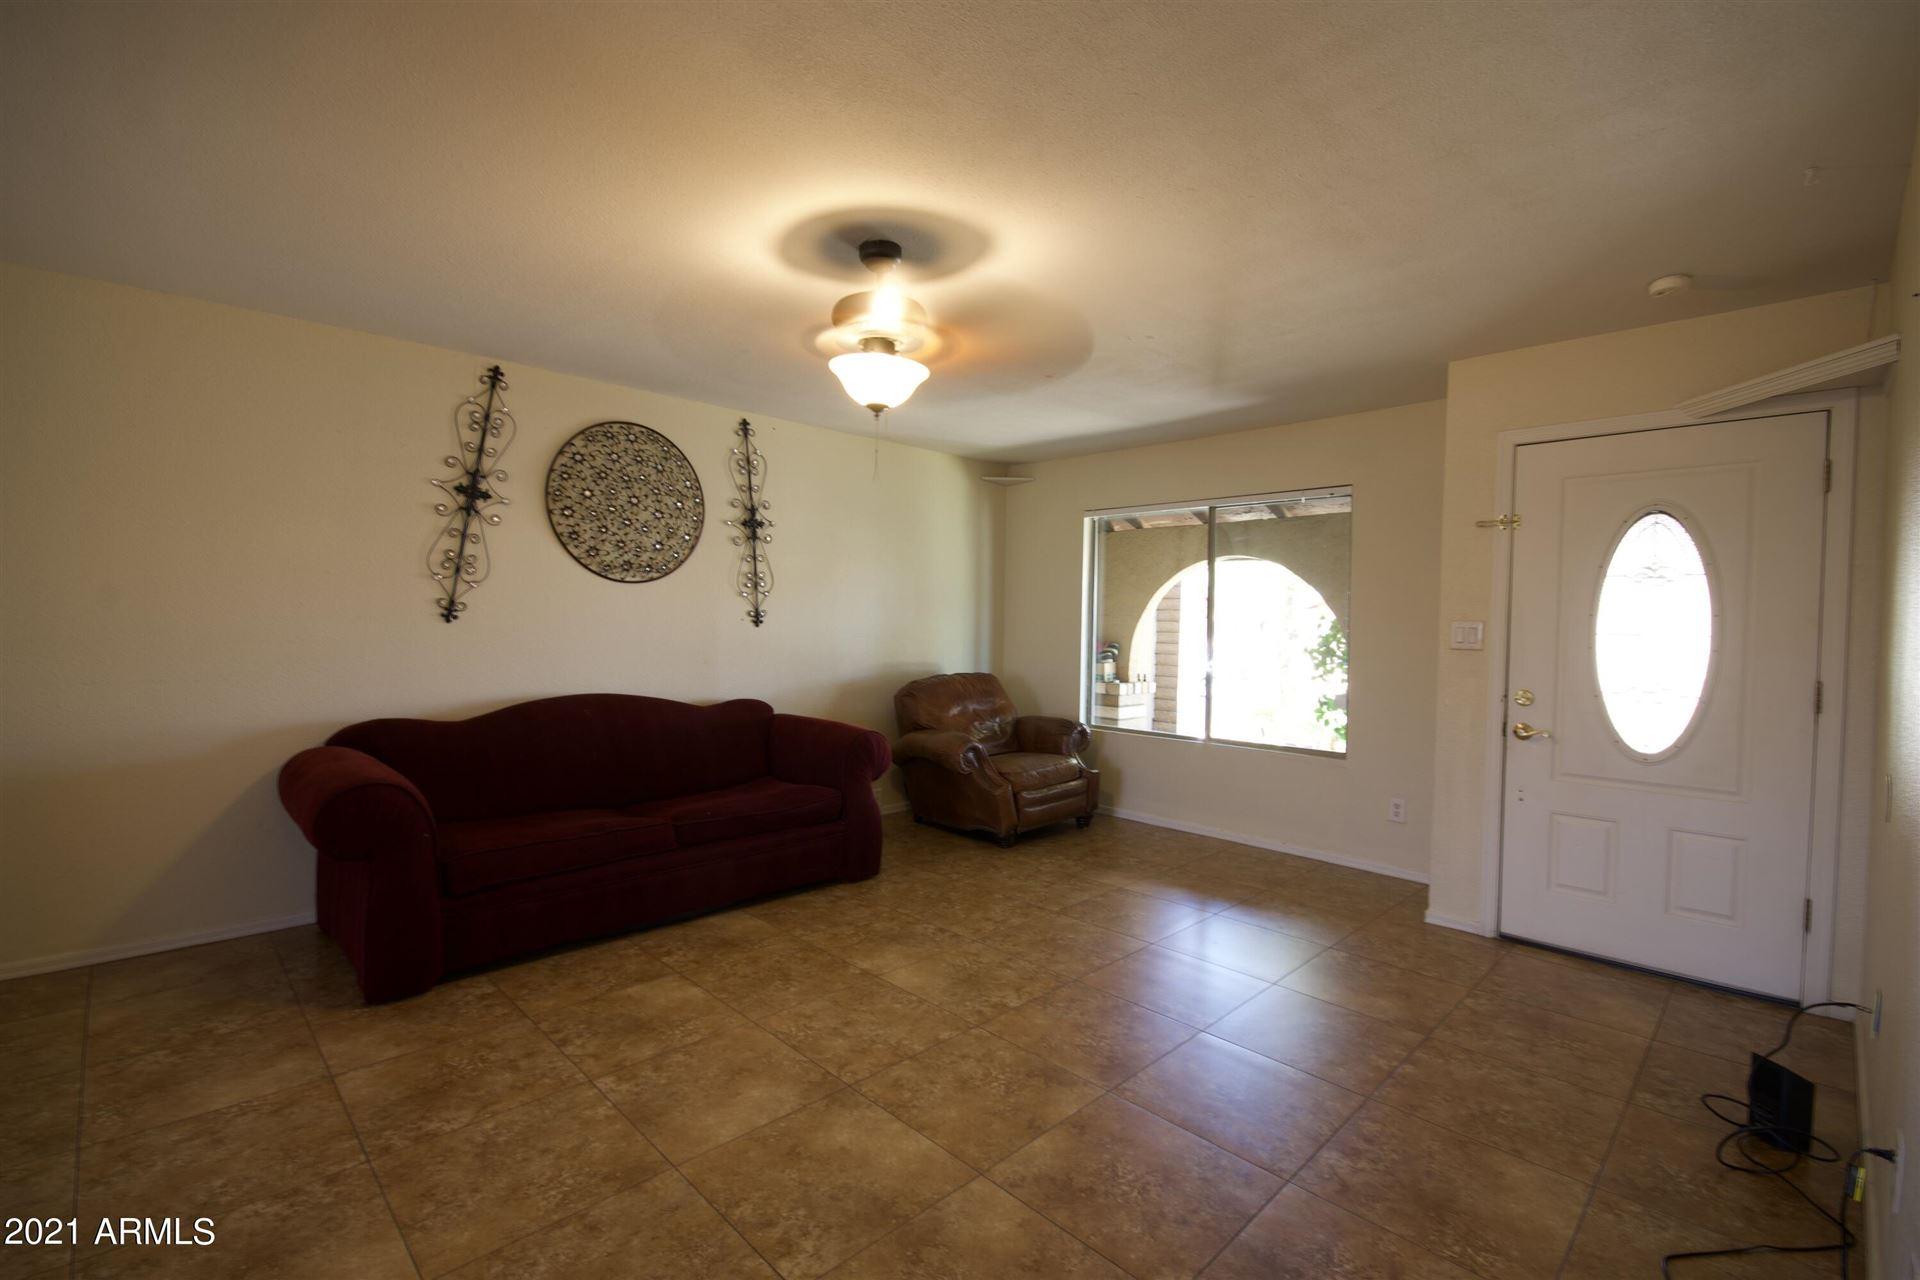 Photo of 4303 W TURQUOISE Avenue, Glendale, AZ 85302 (MLS # 6233621)